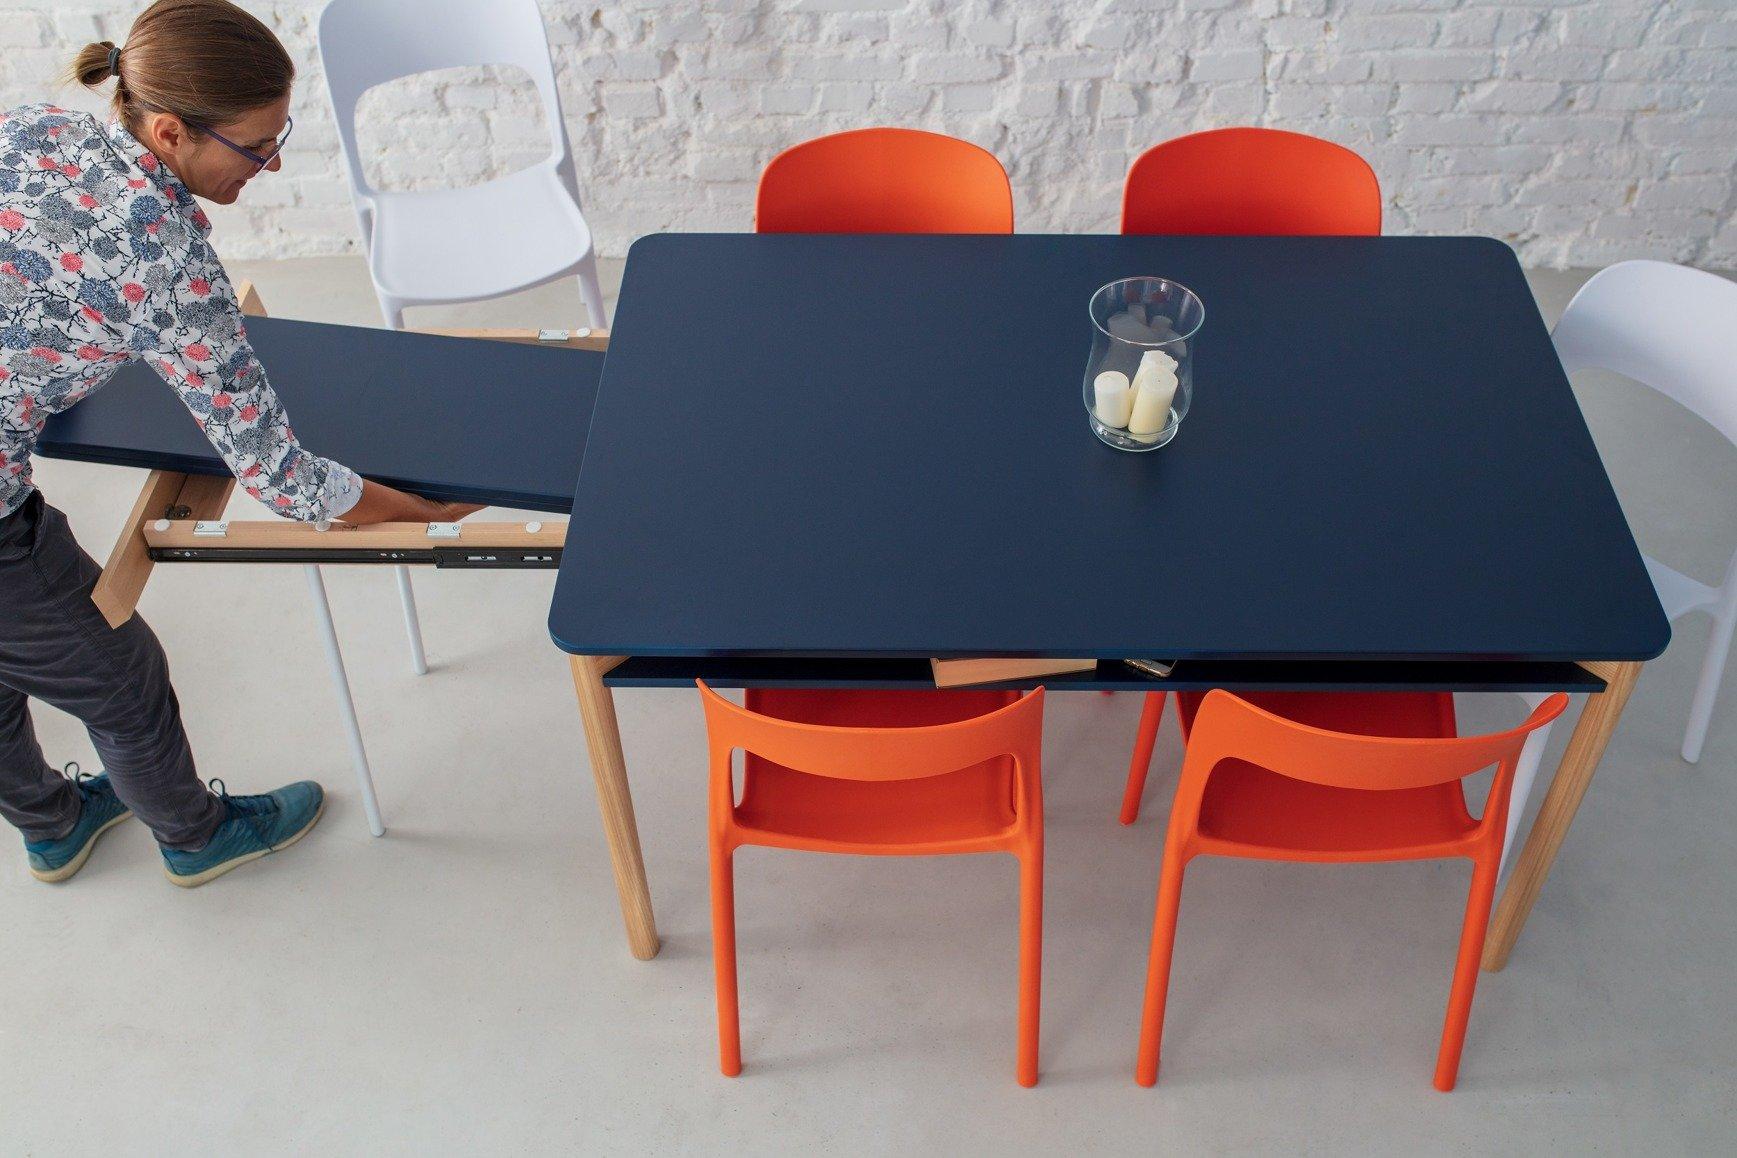 Zeen Ausziehbarer Tisch Mit Regal Weiss Ragaba Moderne Mobel